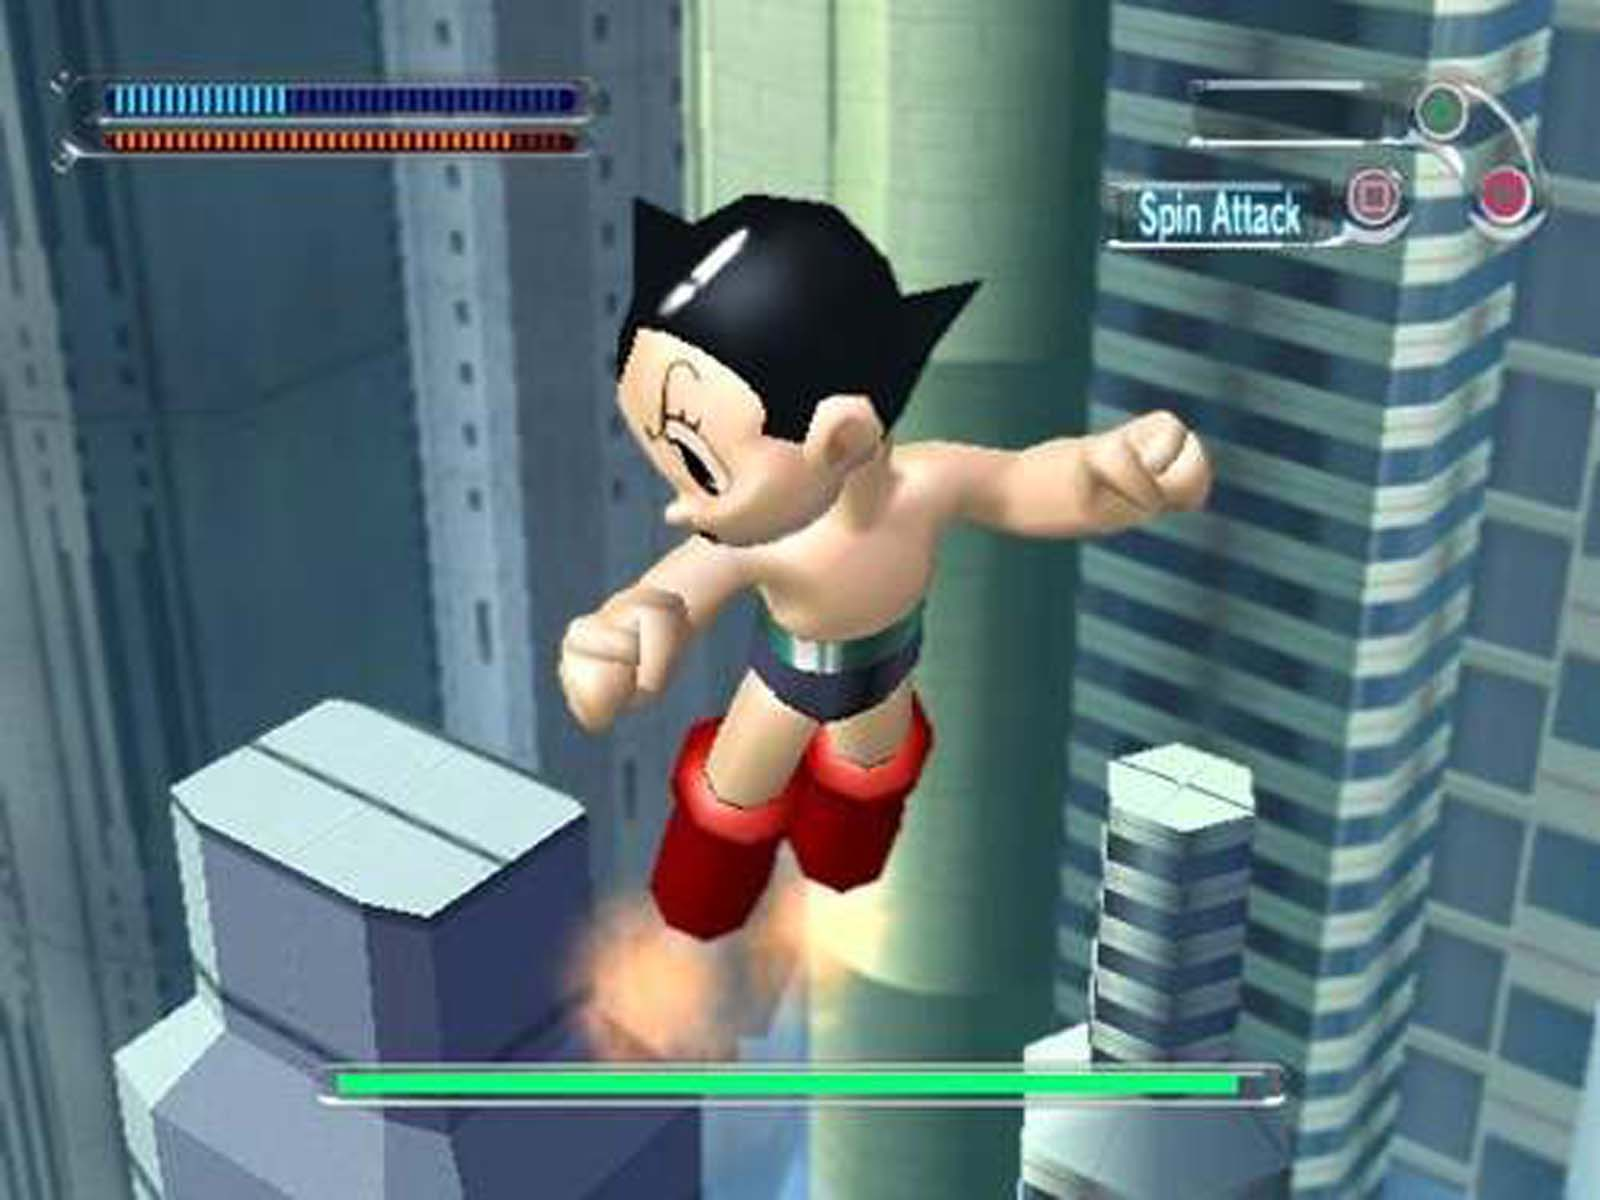 Astro boy 2003 vf torrent